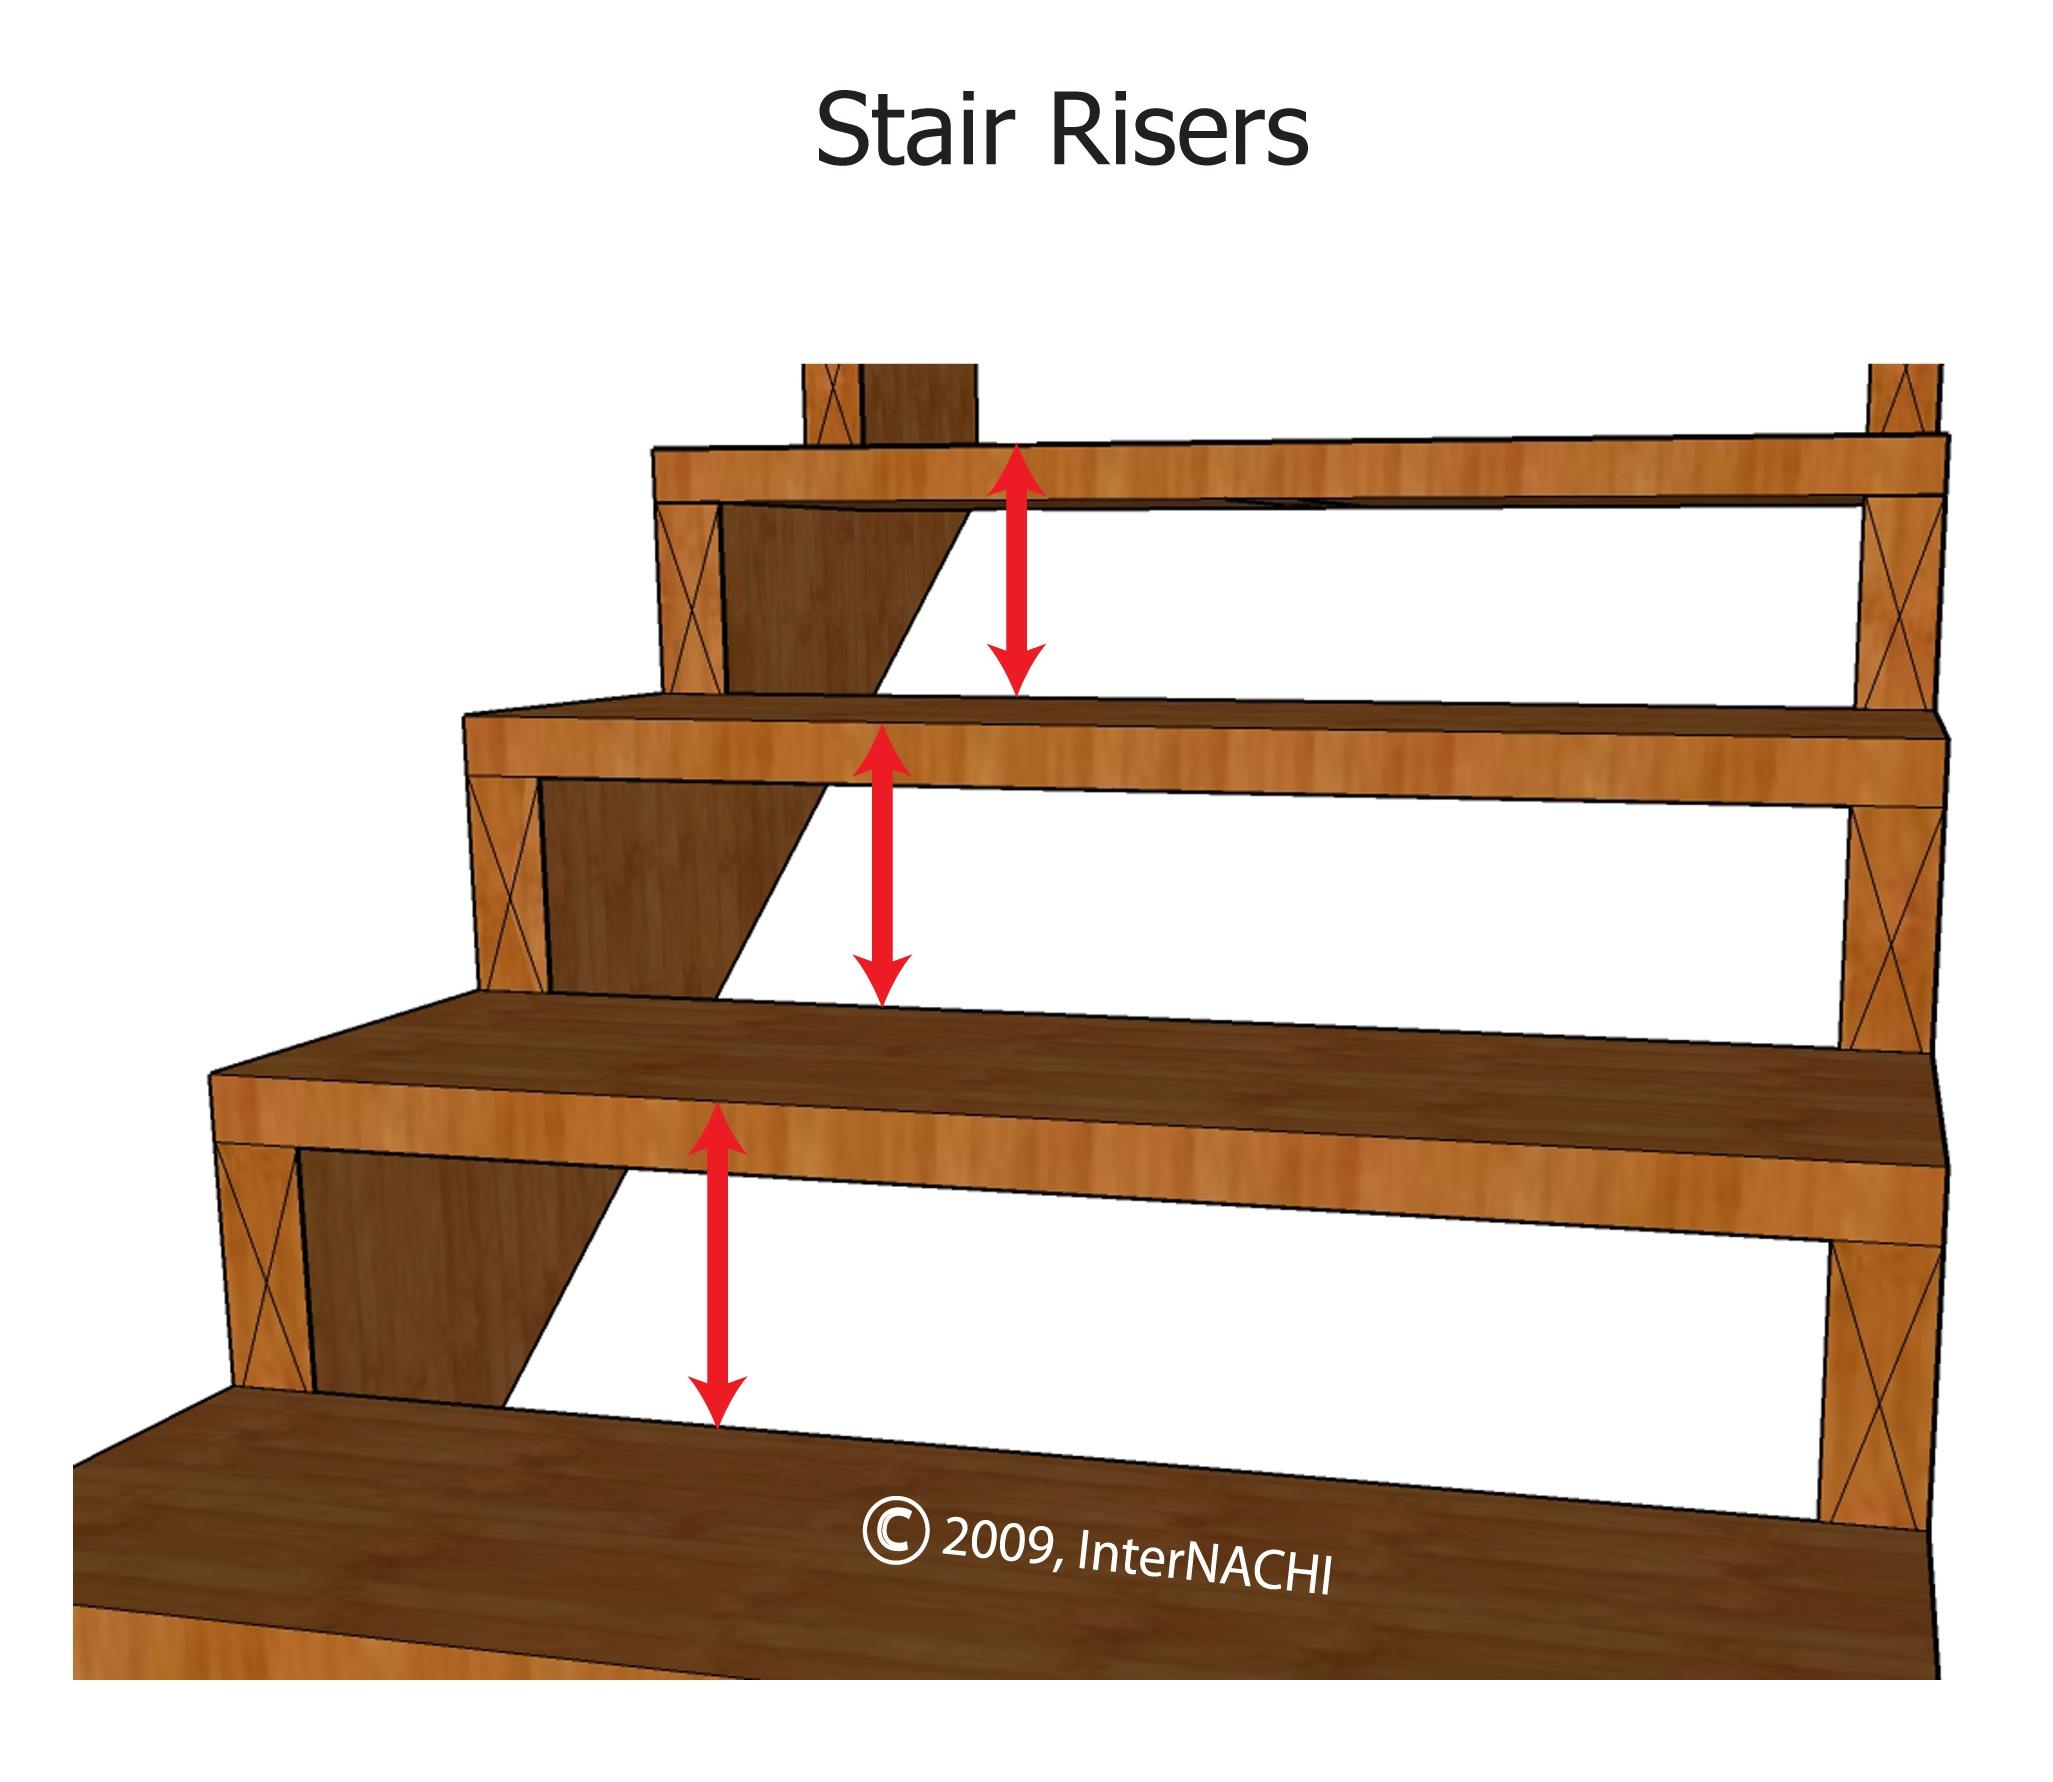 Stair risers.